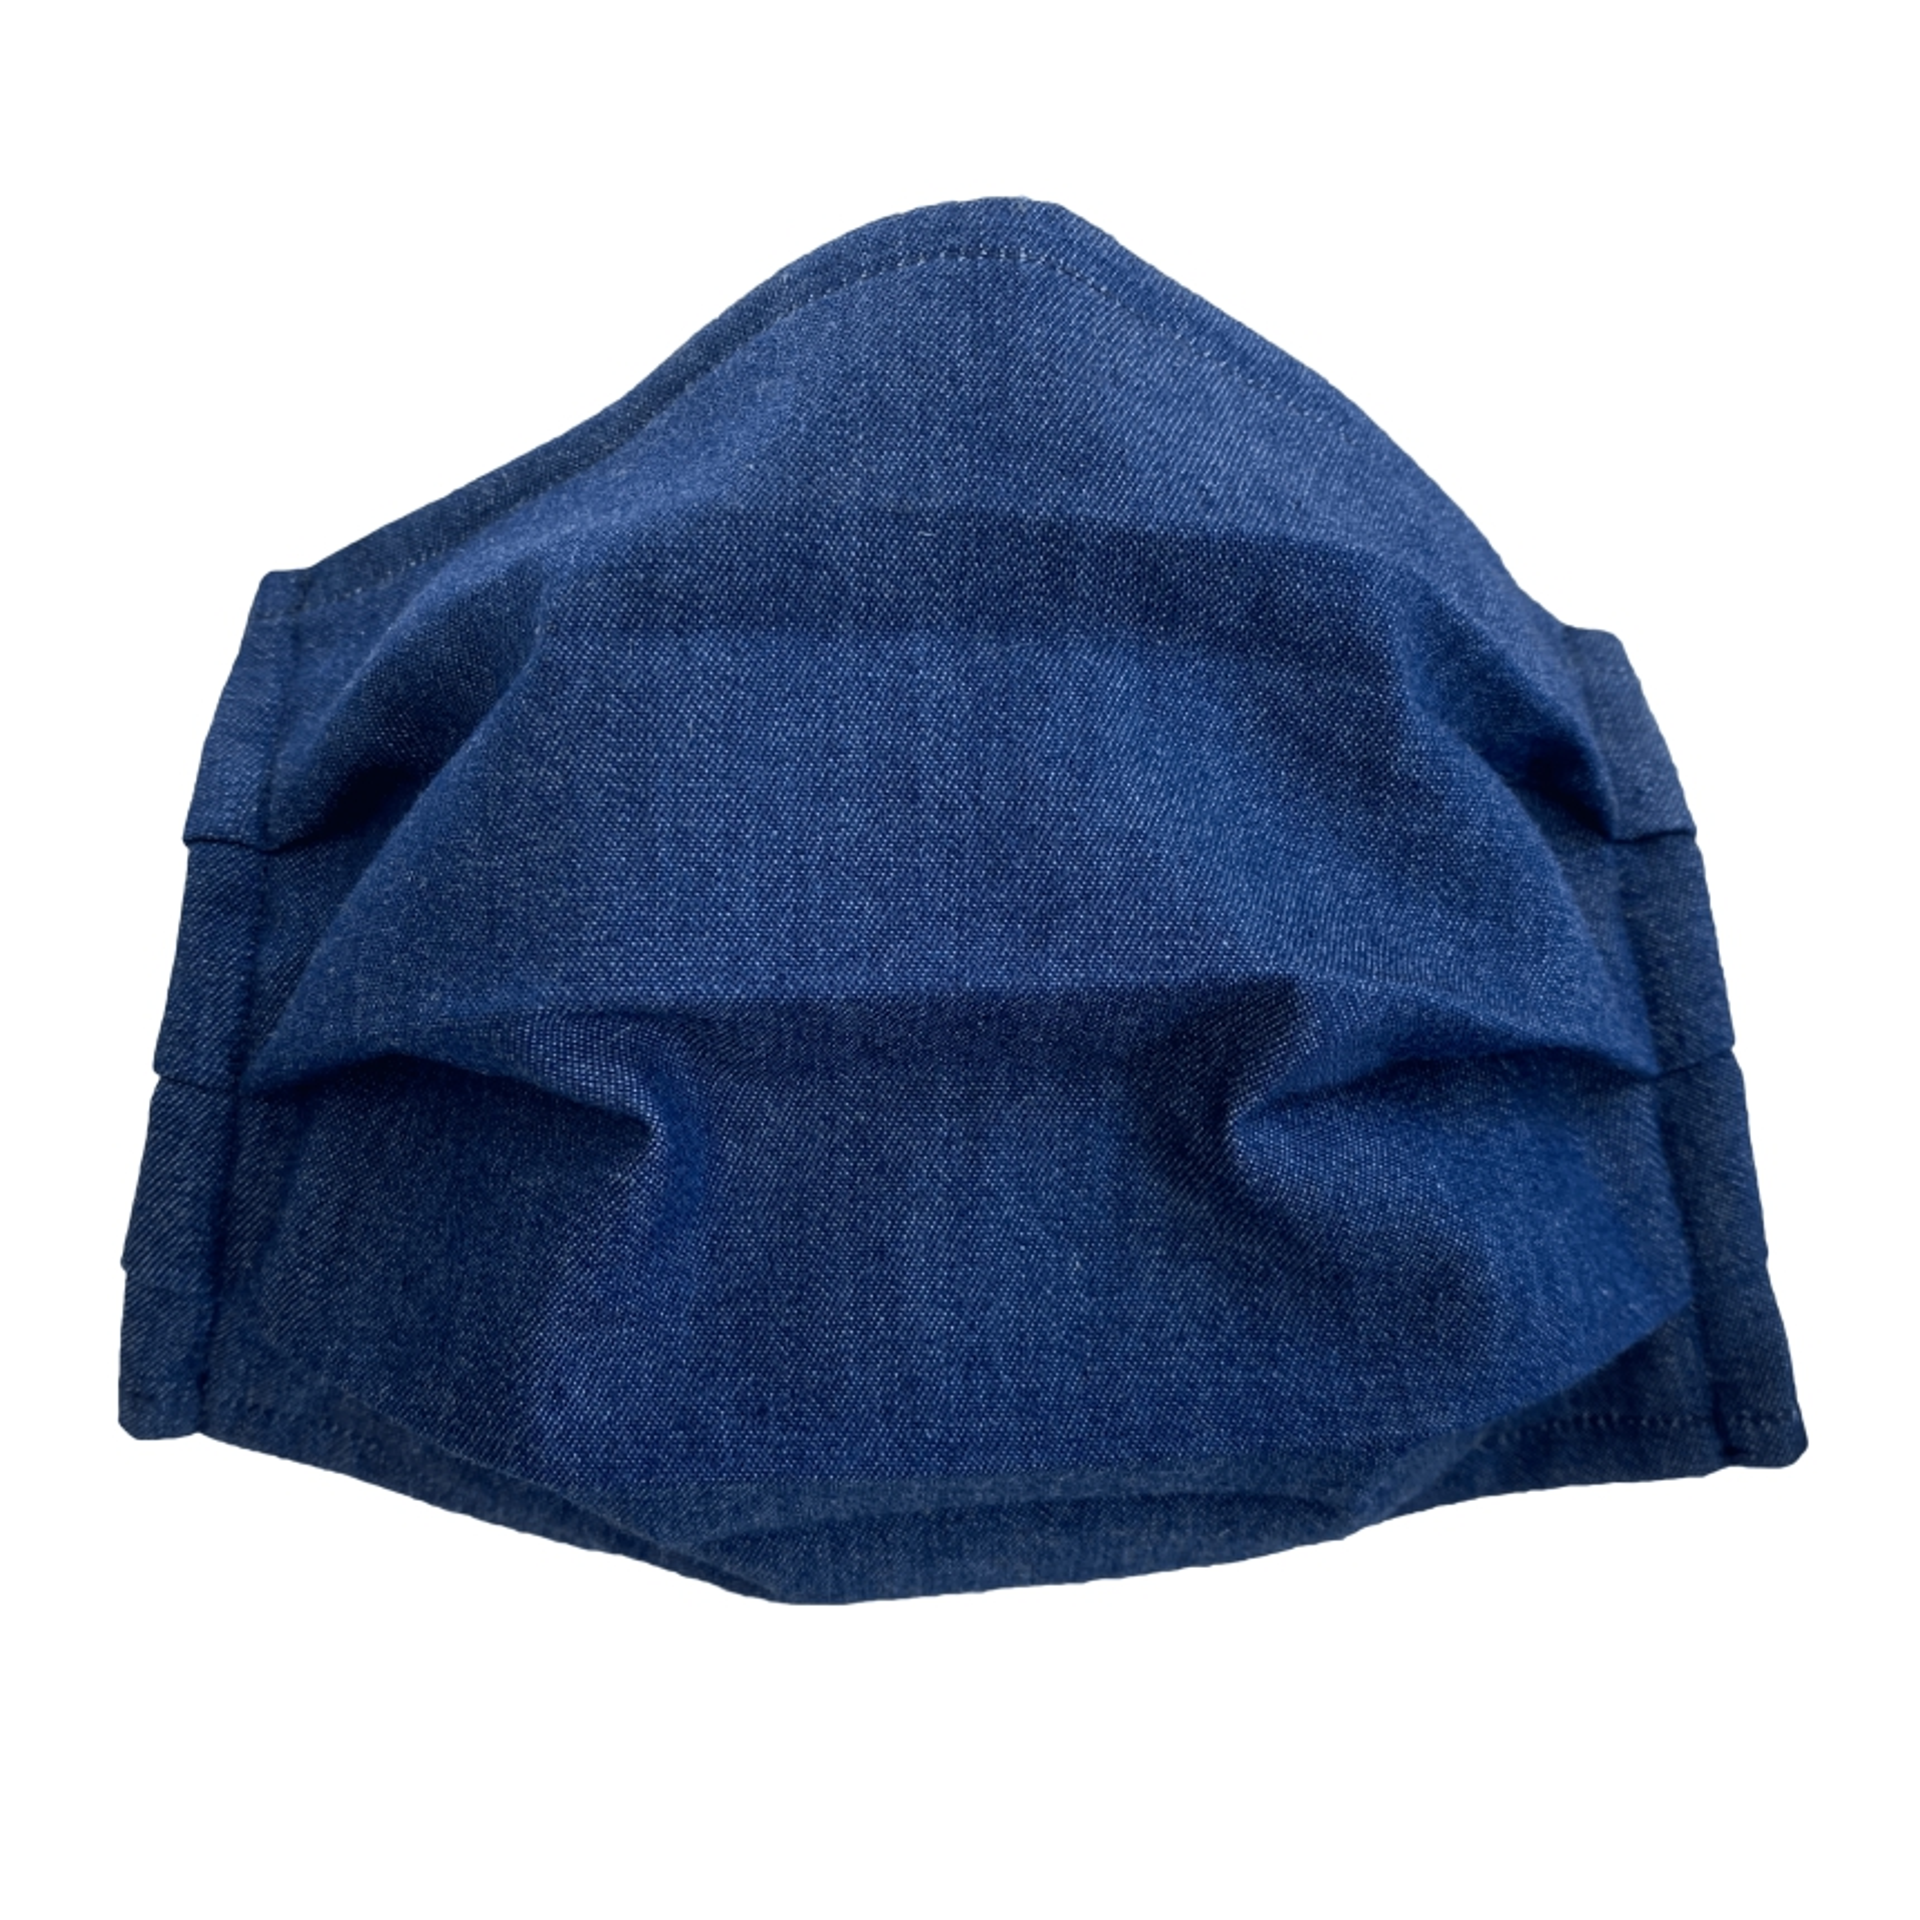 Fashion washable protective fabric mask, cotton, jeans